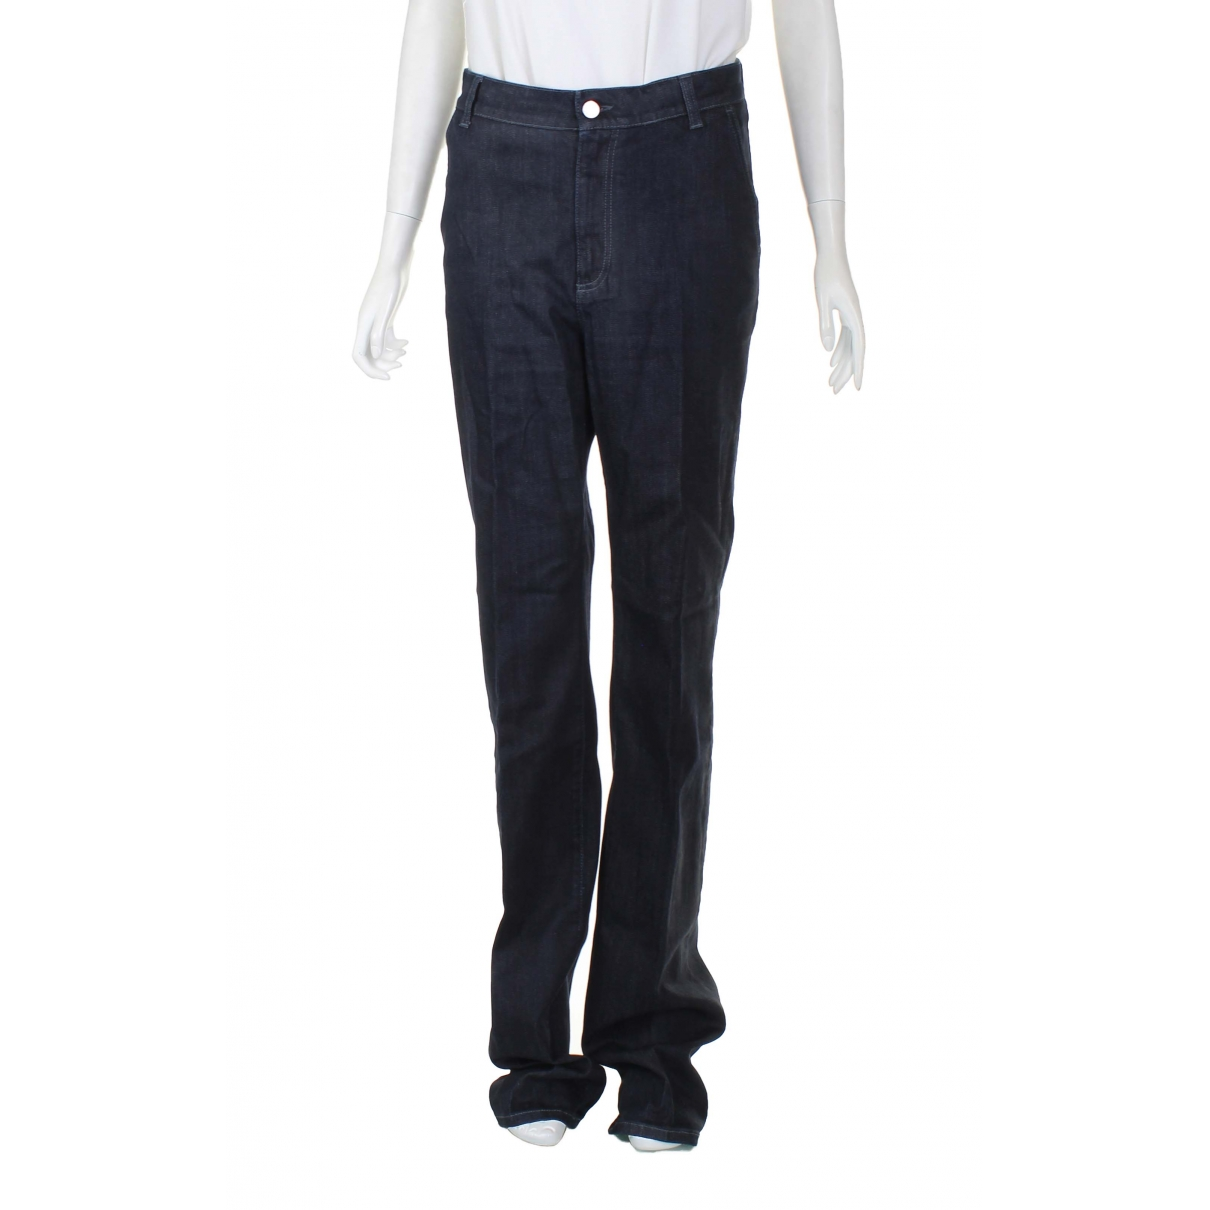 Stella Mccartney \N Black Denim - Jeans Jeans for Women 40 FR